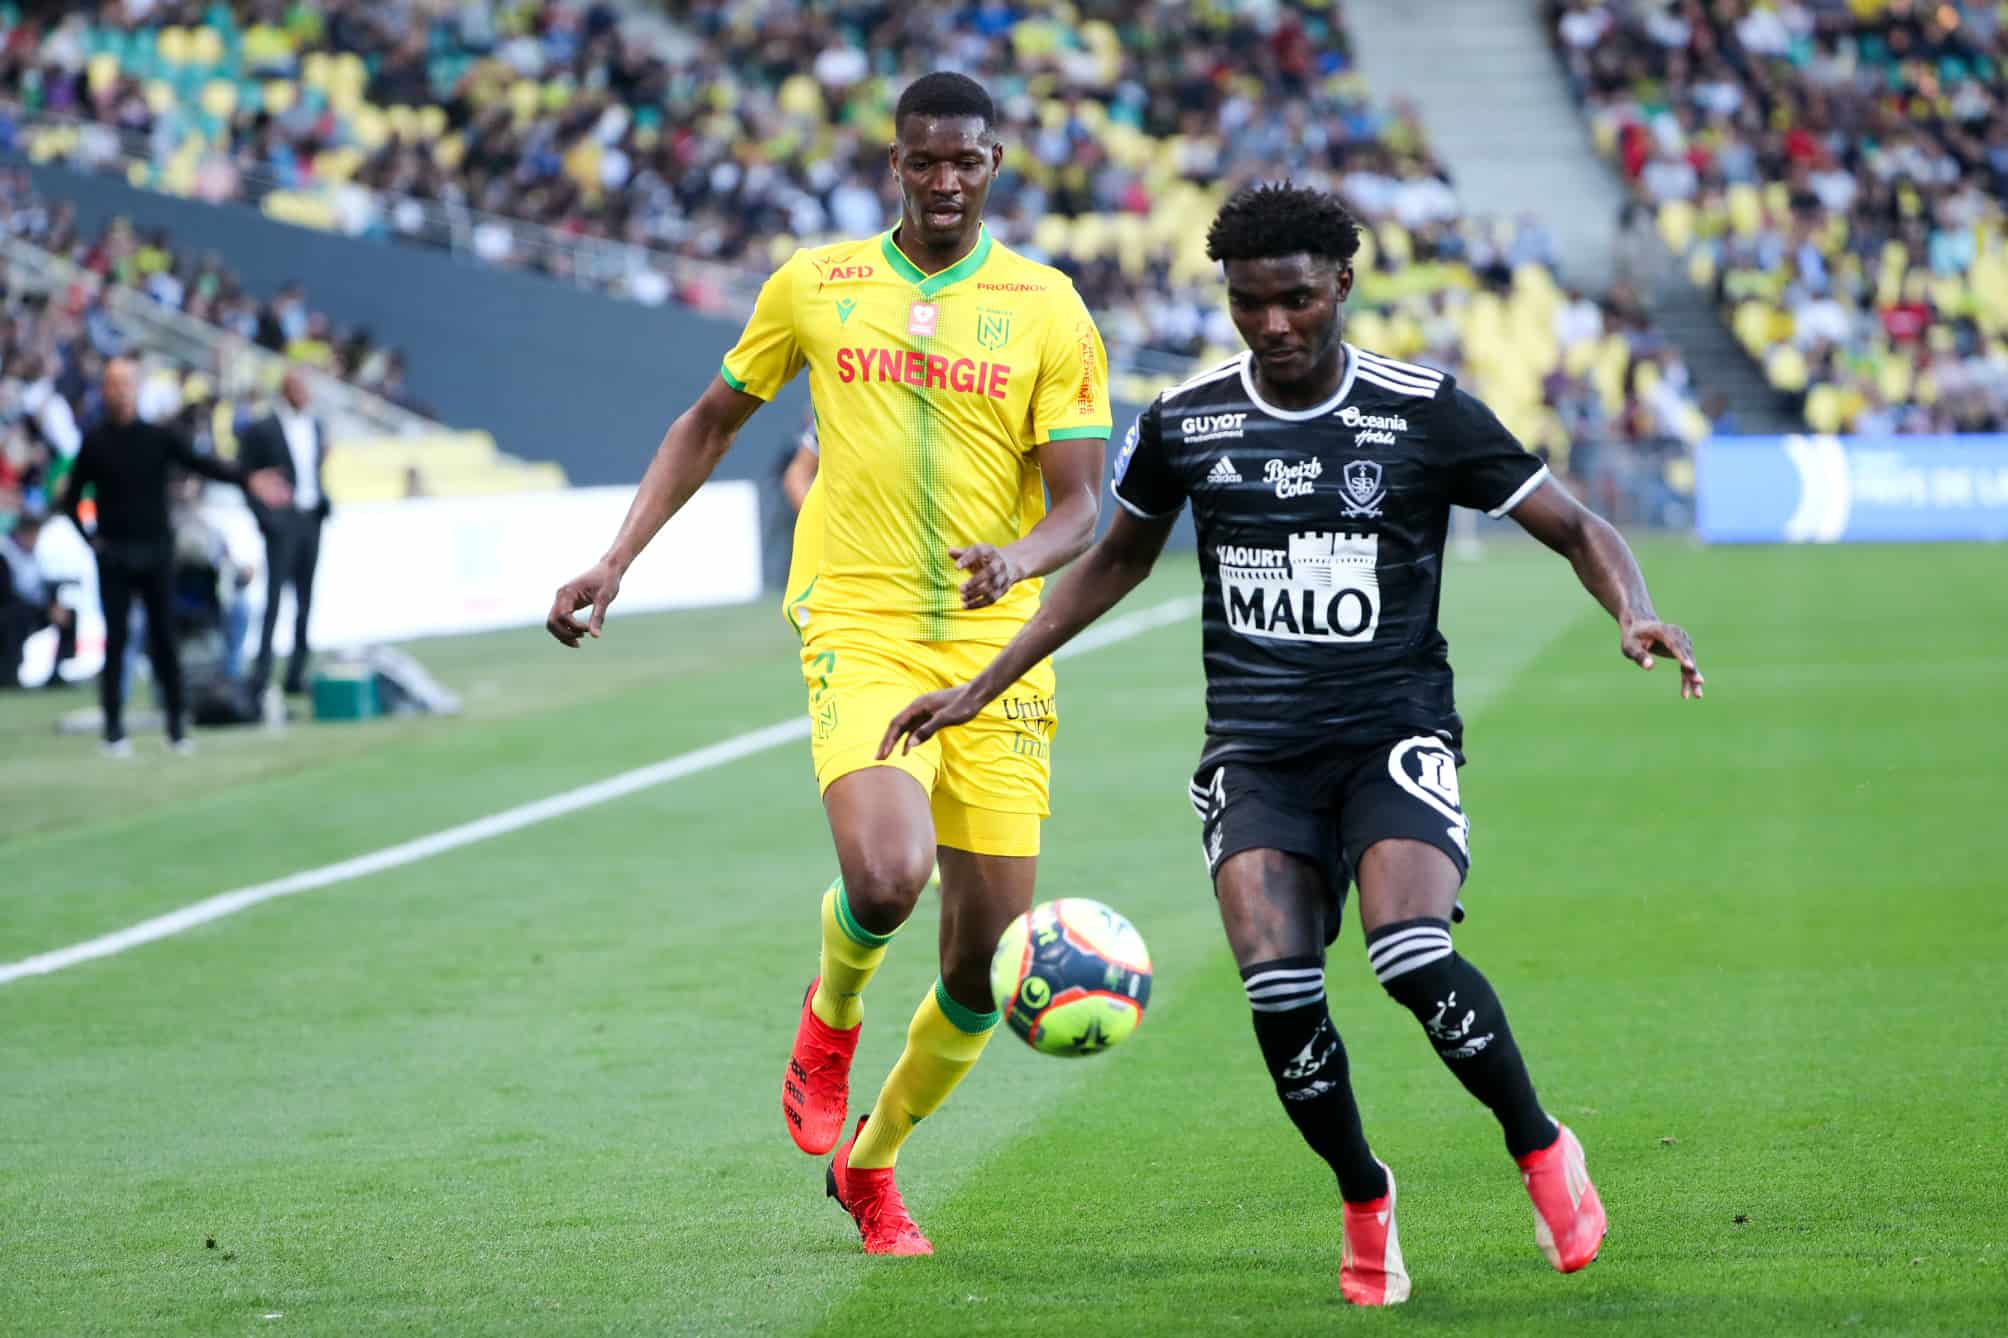 Ponturi pariuri Brest vs FC Metz